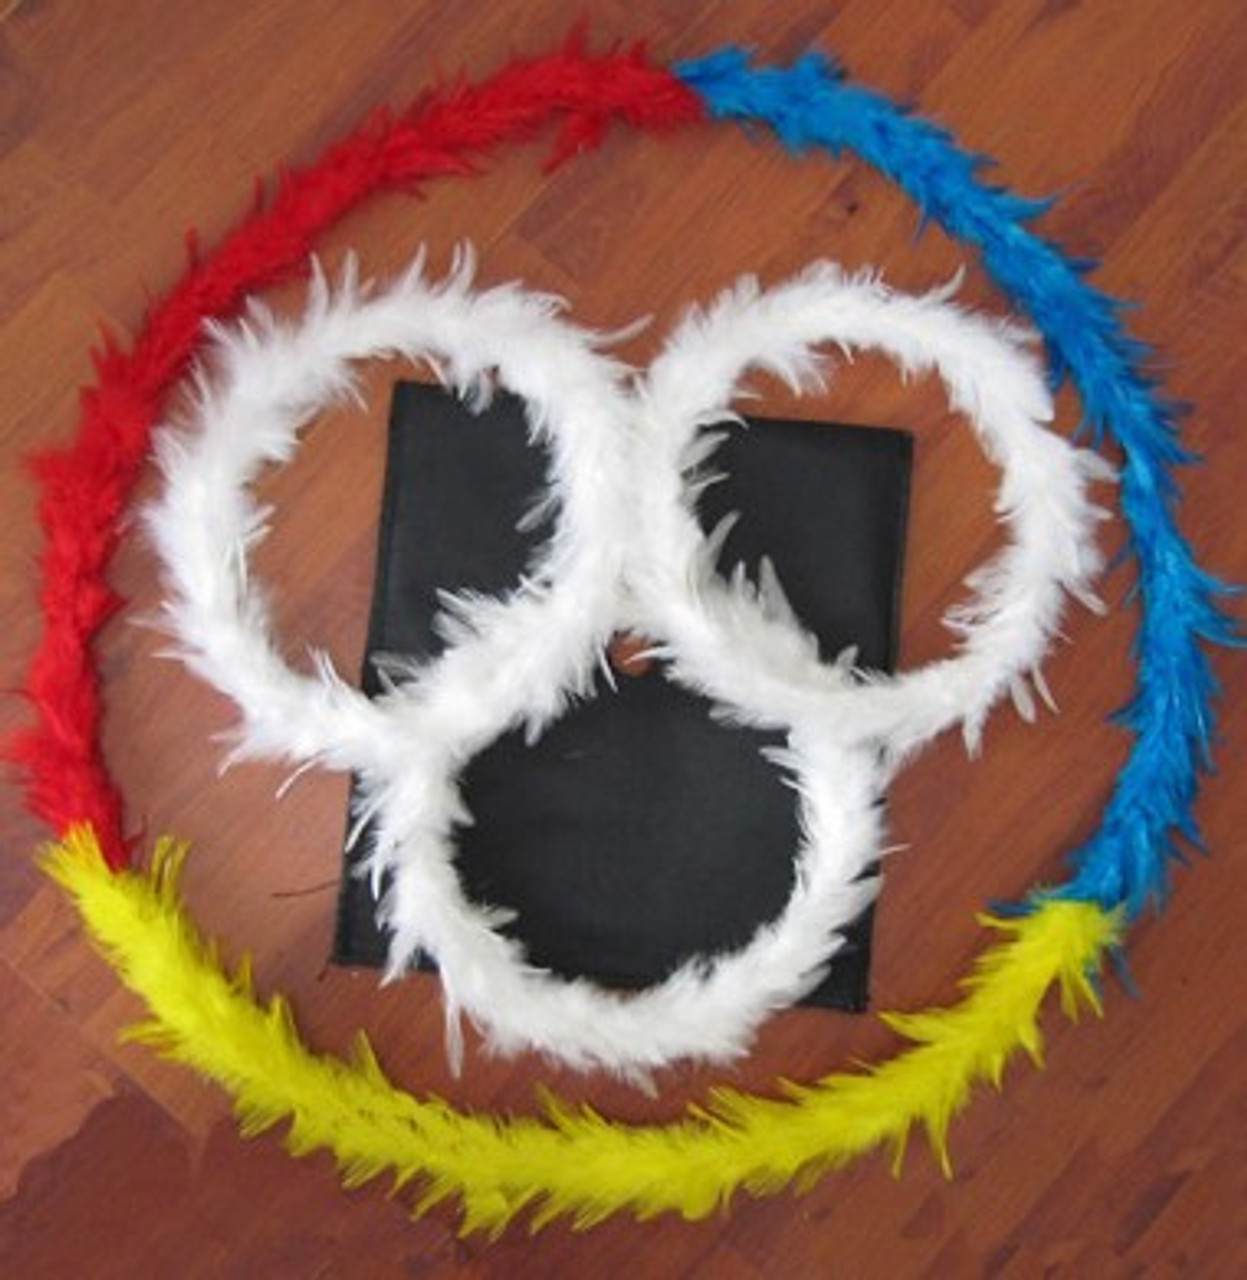 Colour Changing Wreaths Magic Trick Gospel Kids